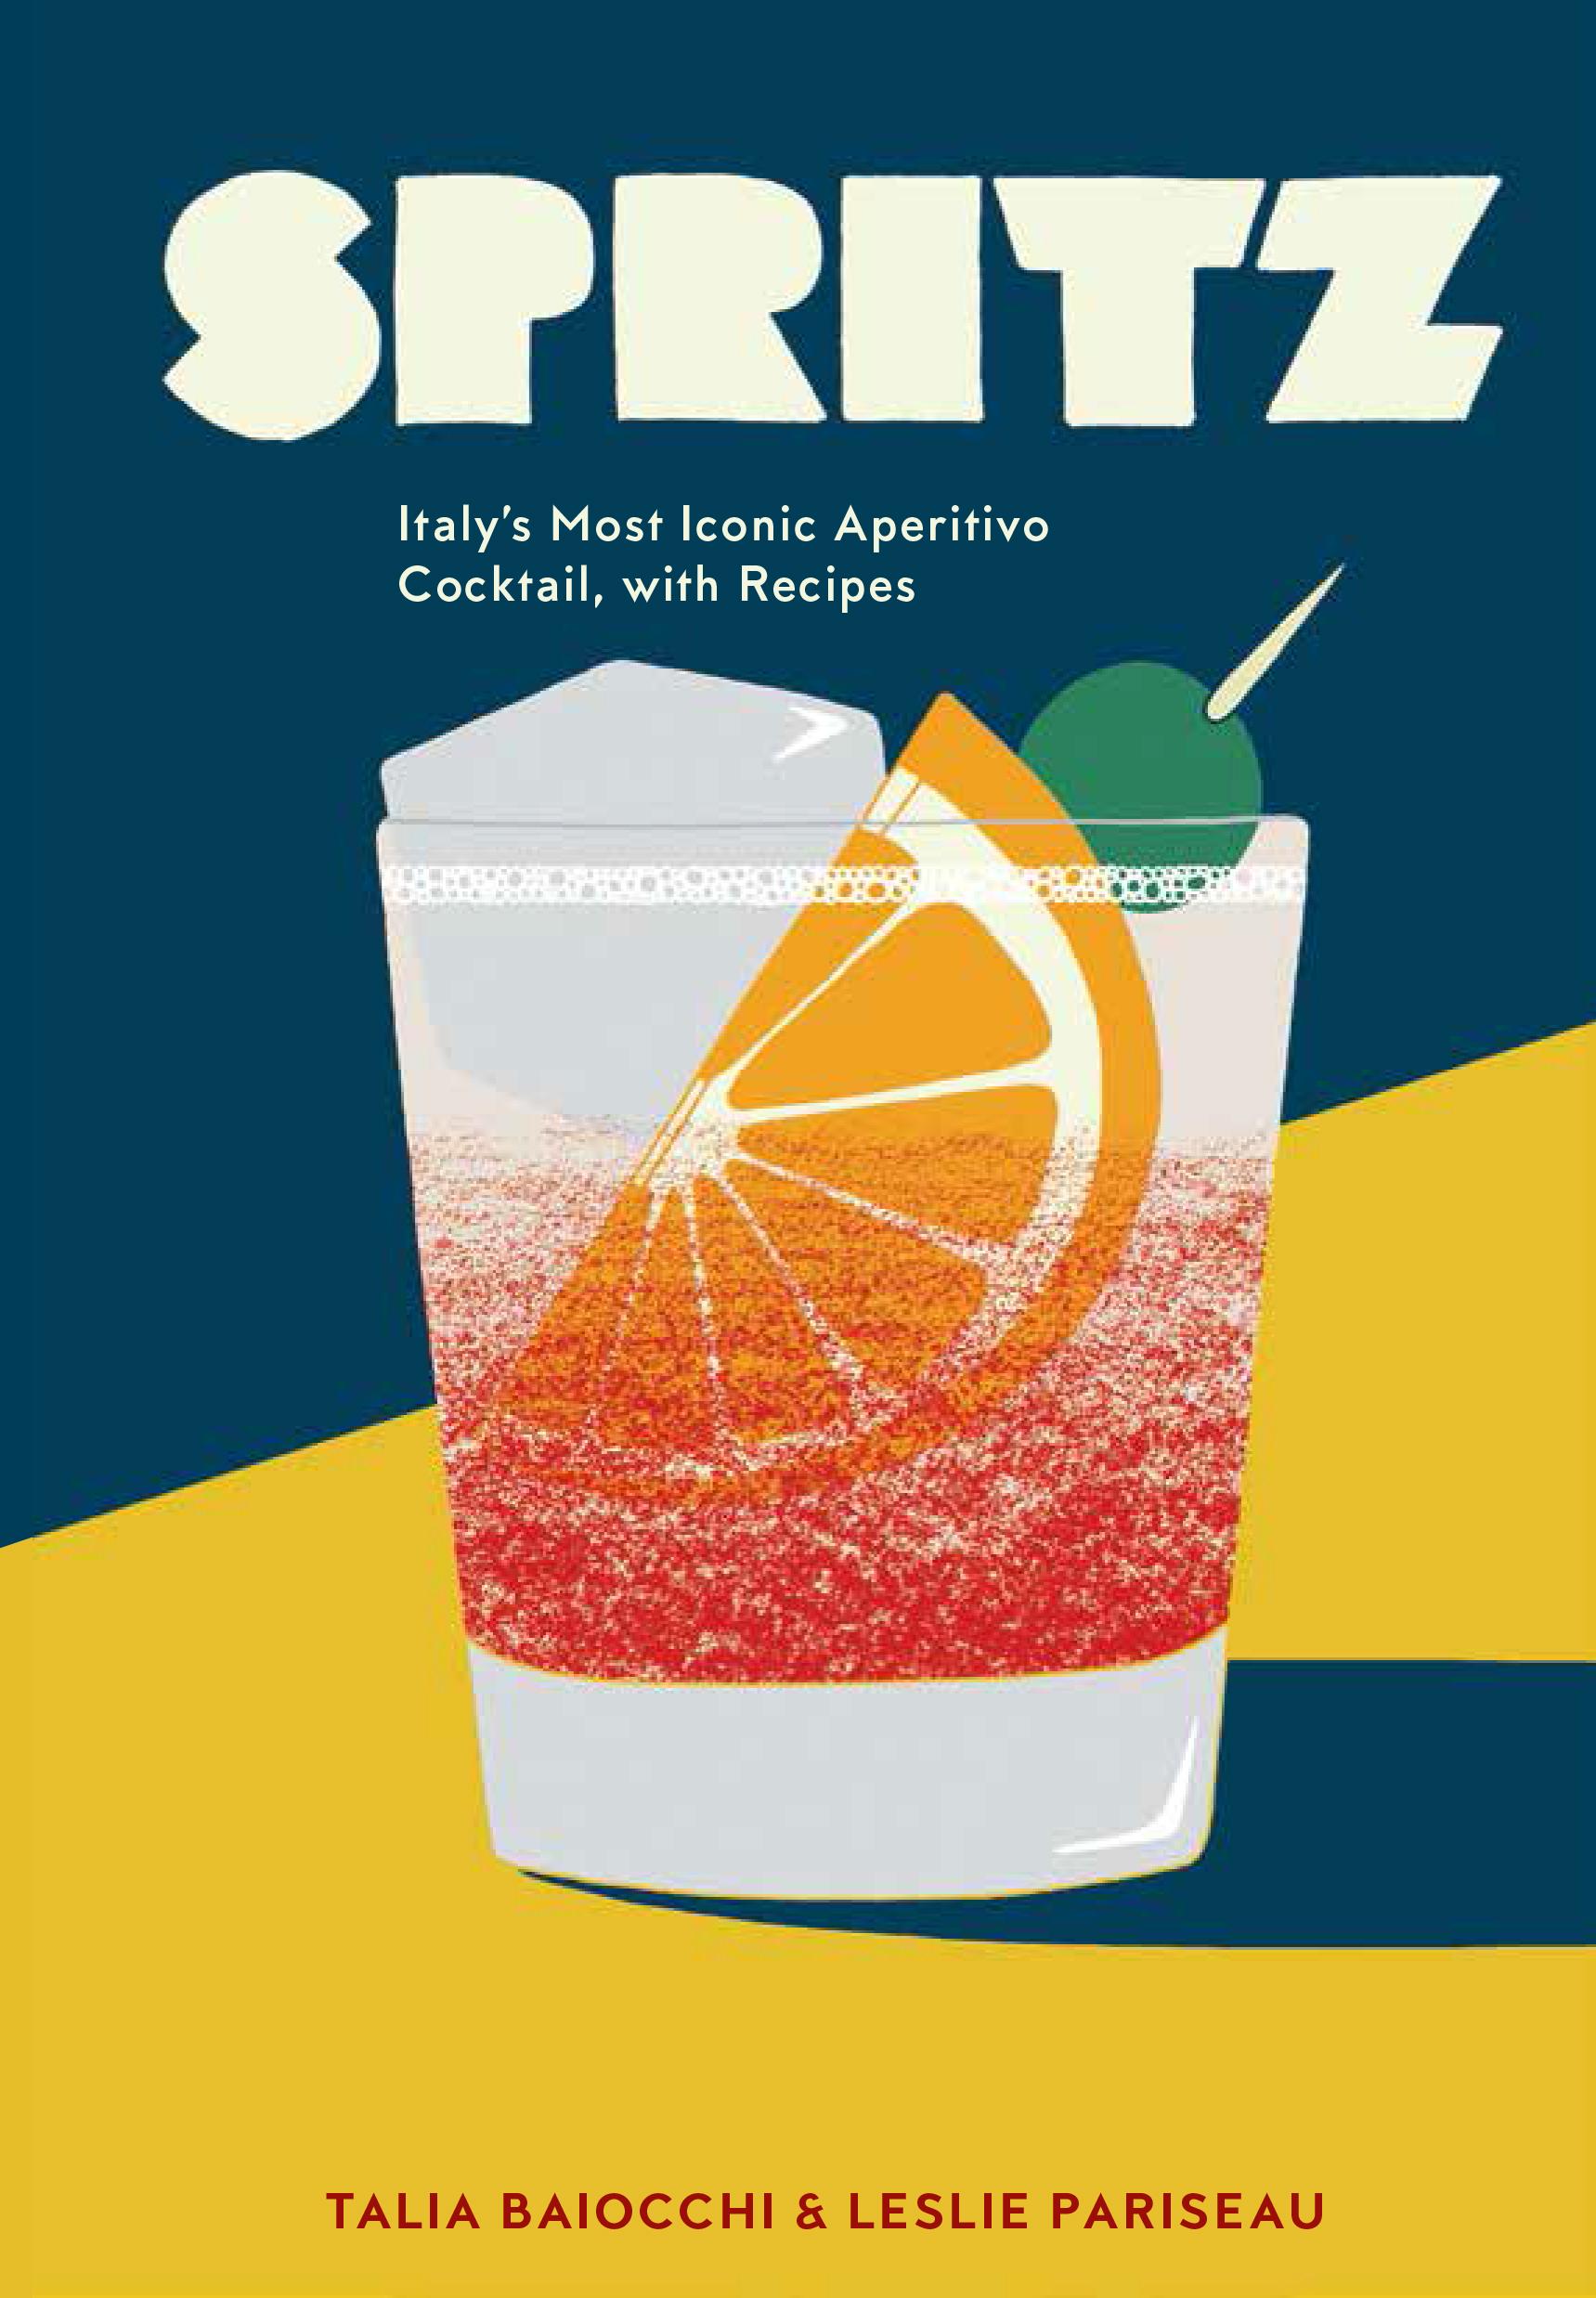 spritz book cover